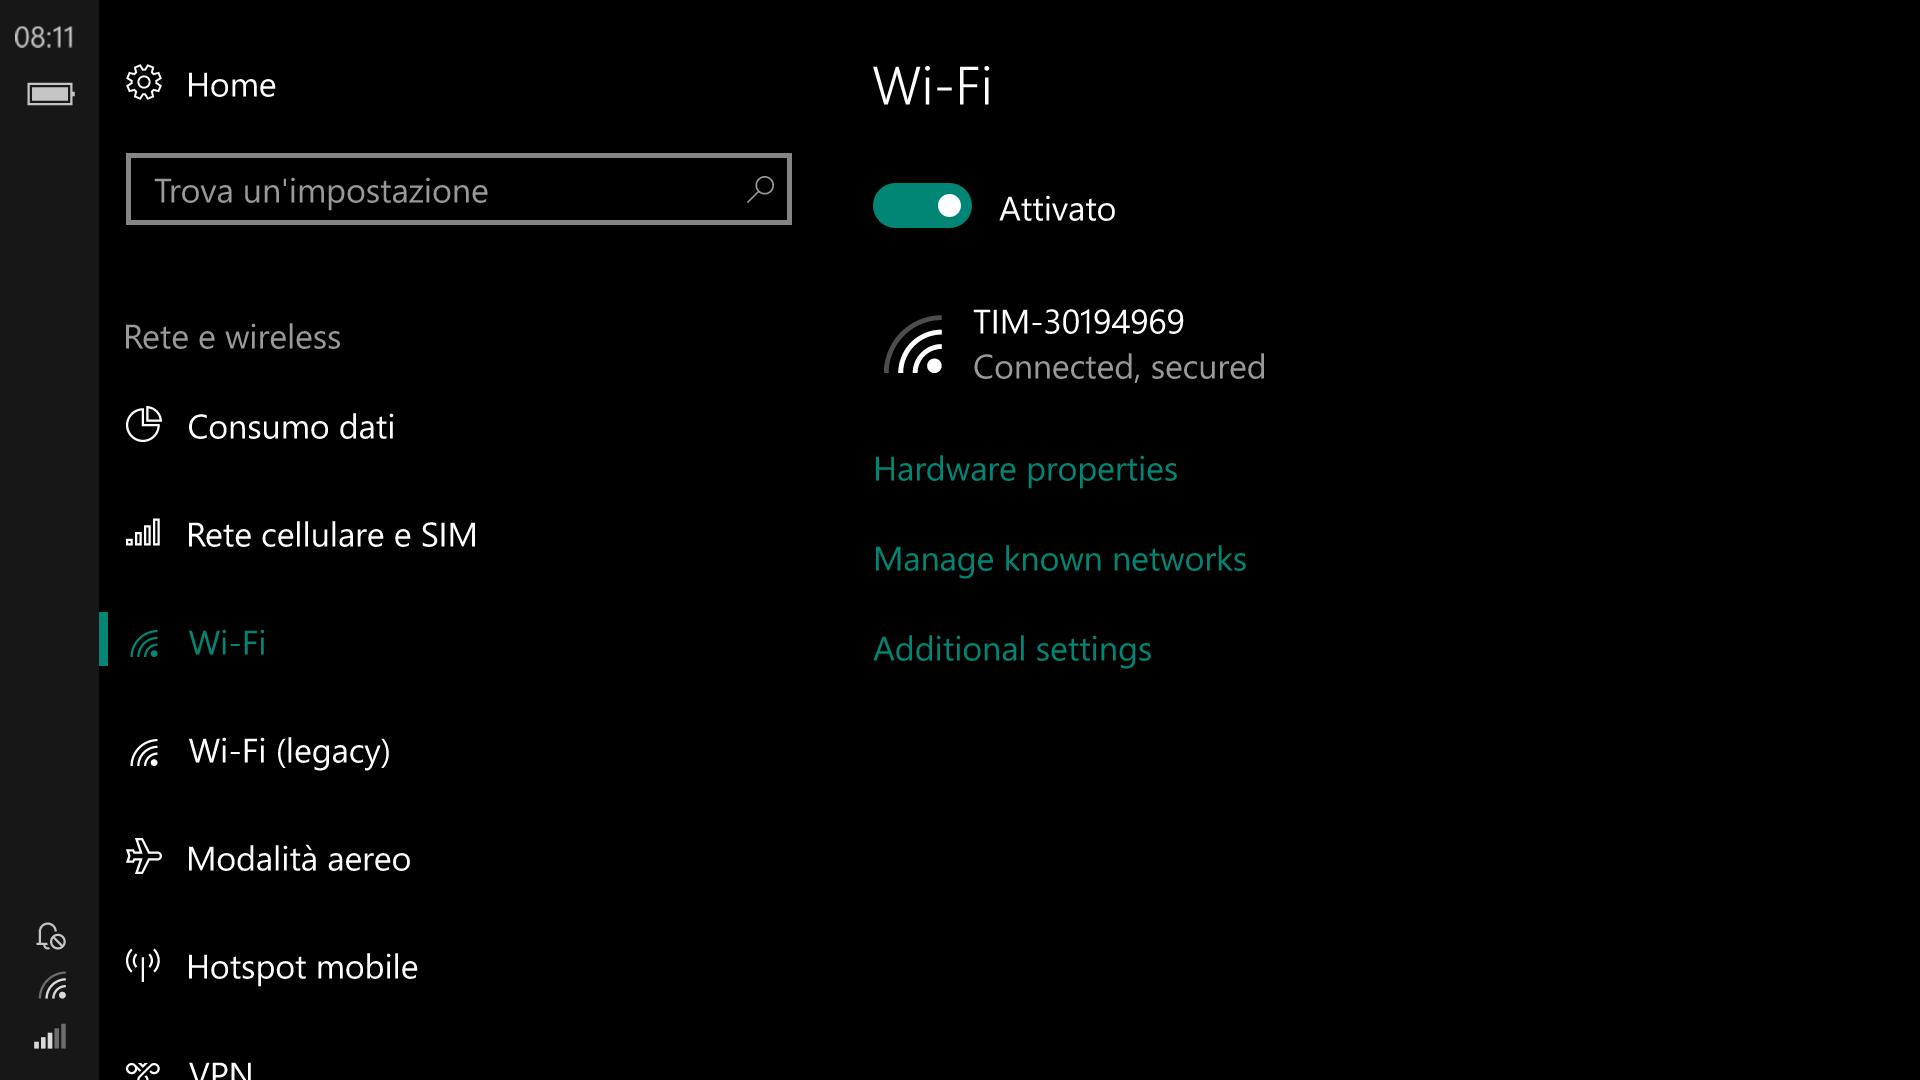 wifi-legacy